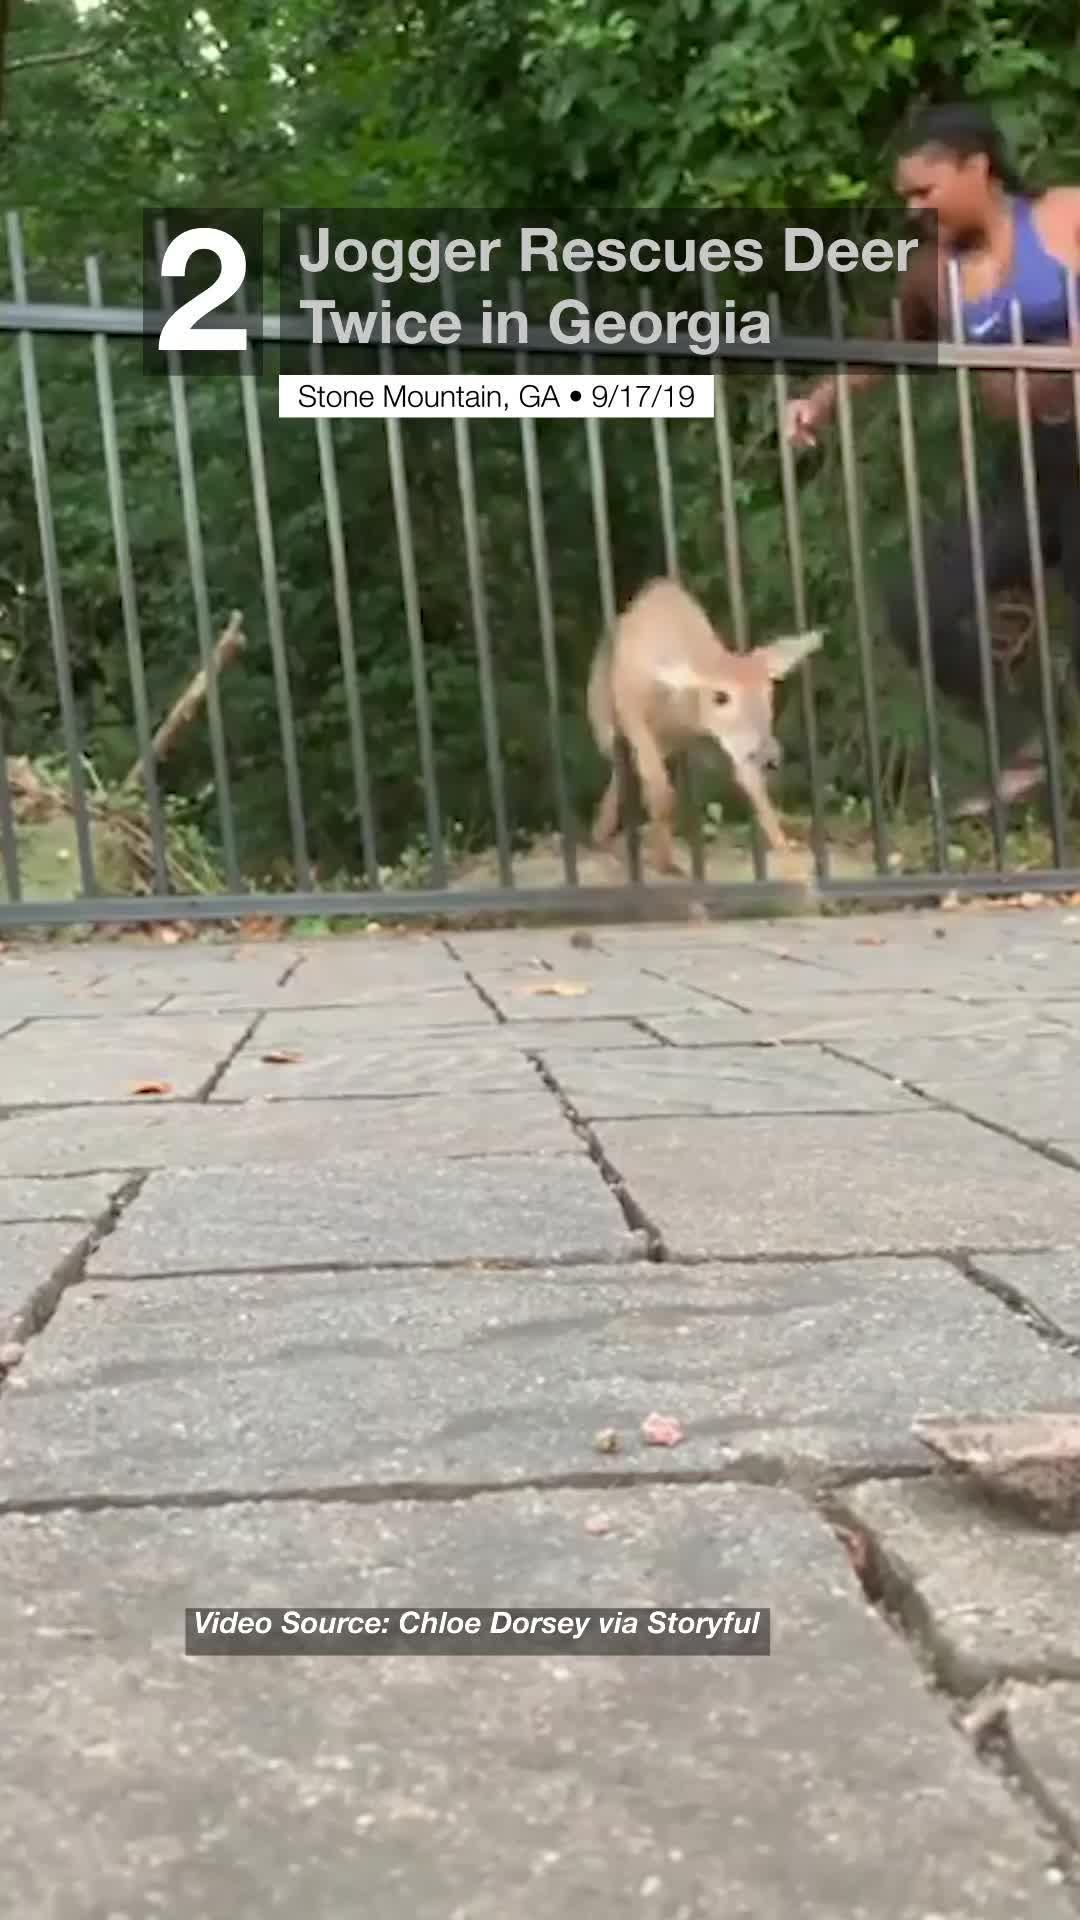 Jogger Rescues Deer Twice in Georgia